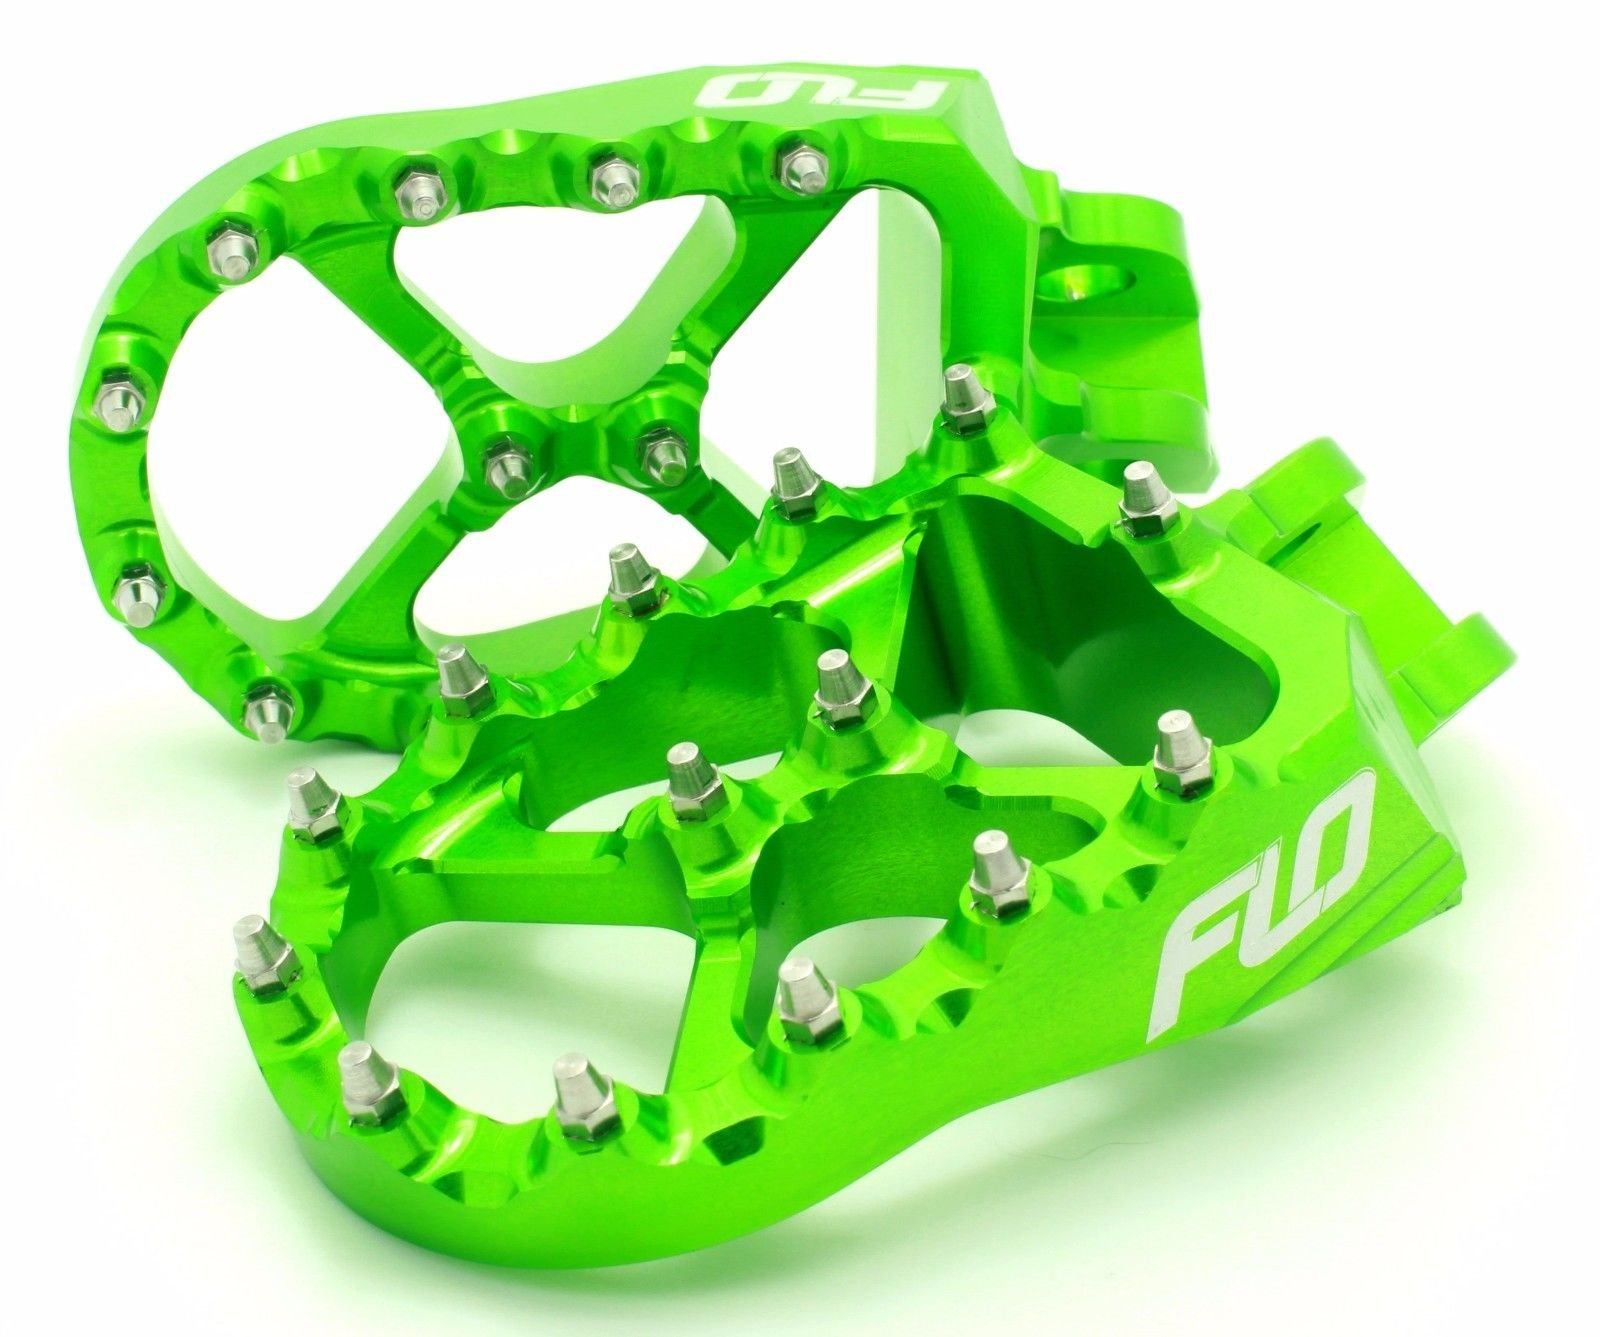 Flo Motorsports Green Kawasaki KXF250/450 Foot Pegs Fpeg-792Grn by Flo Motorsports